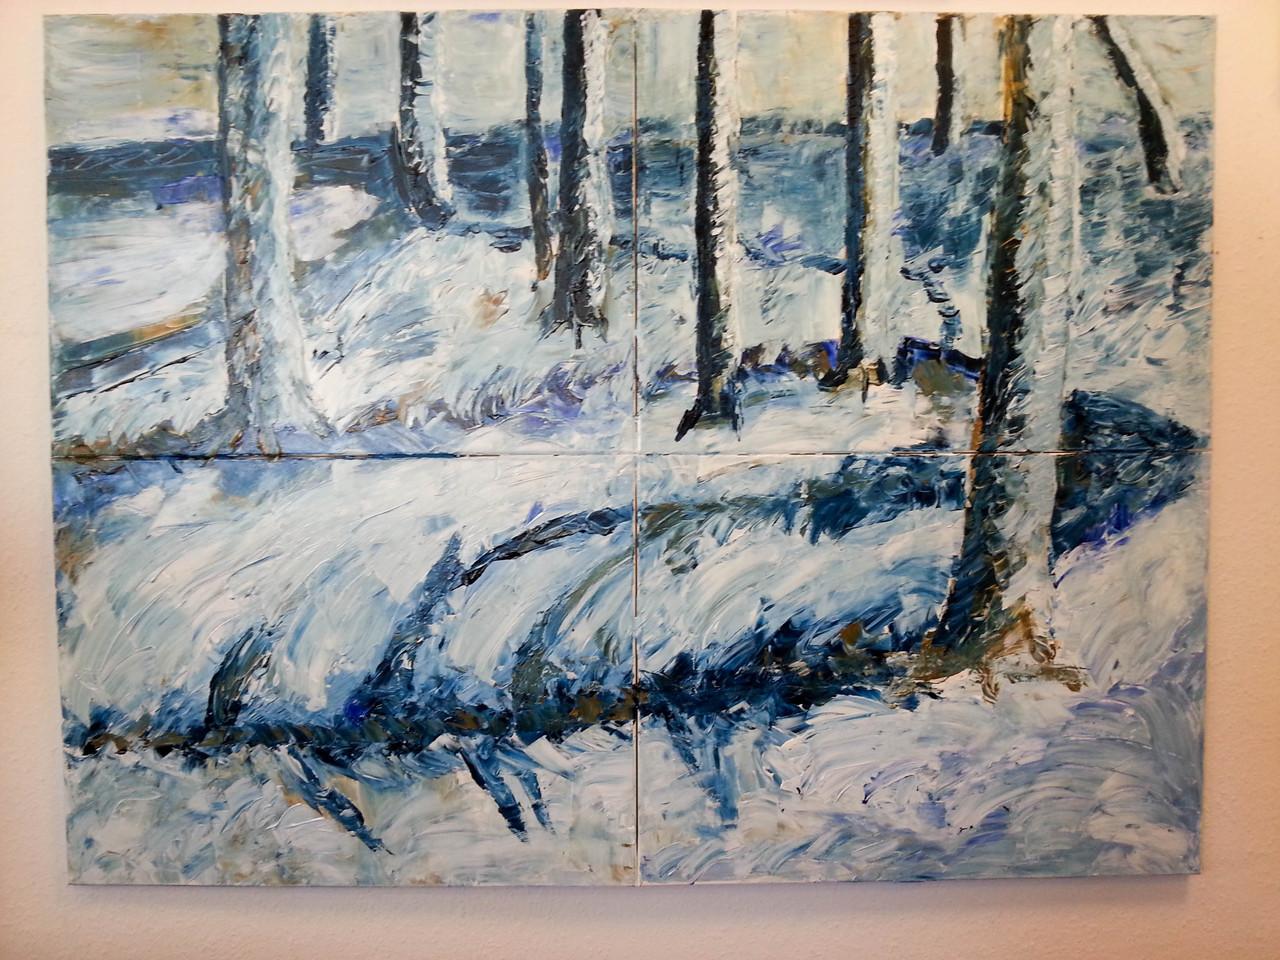 Acryl auf Leinwand, 120 x 160cm